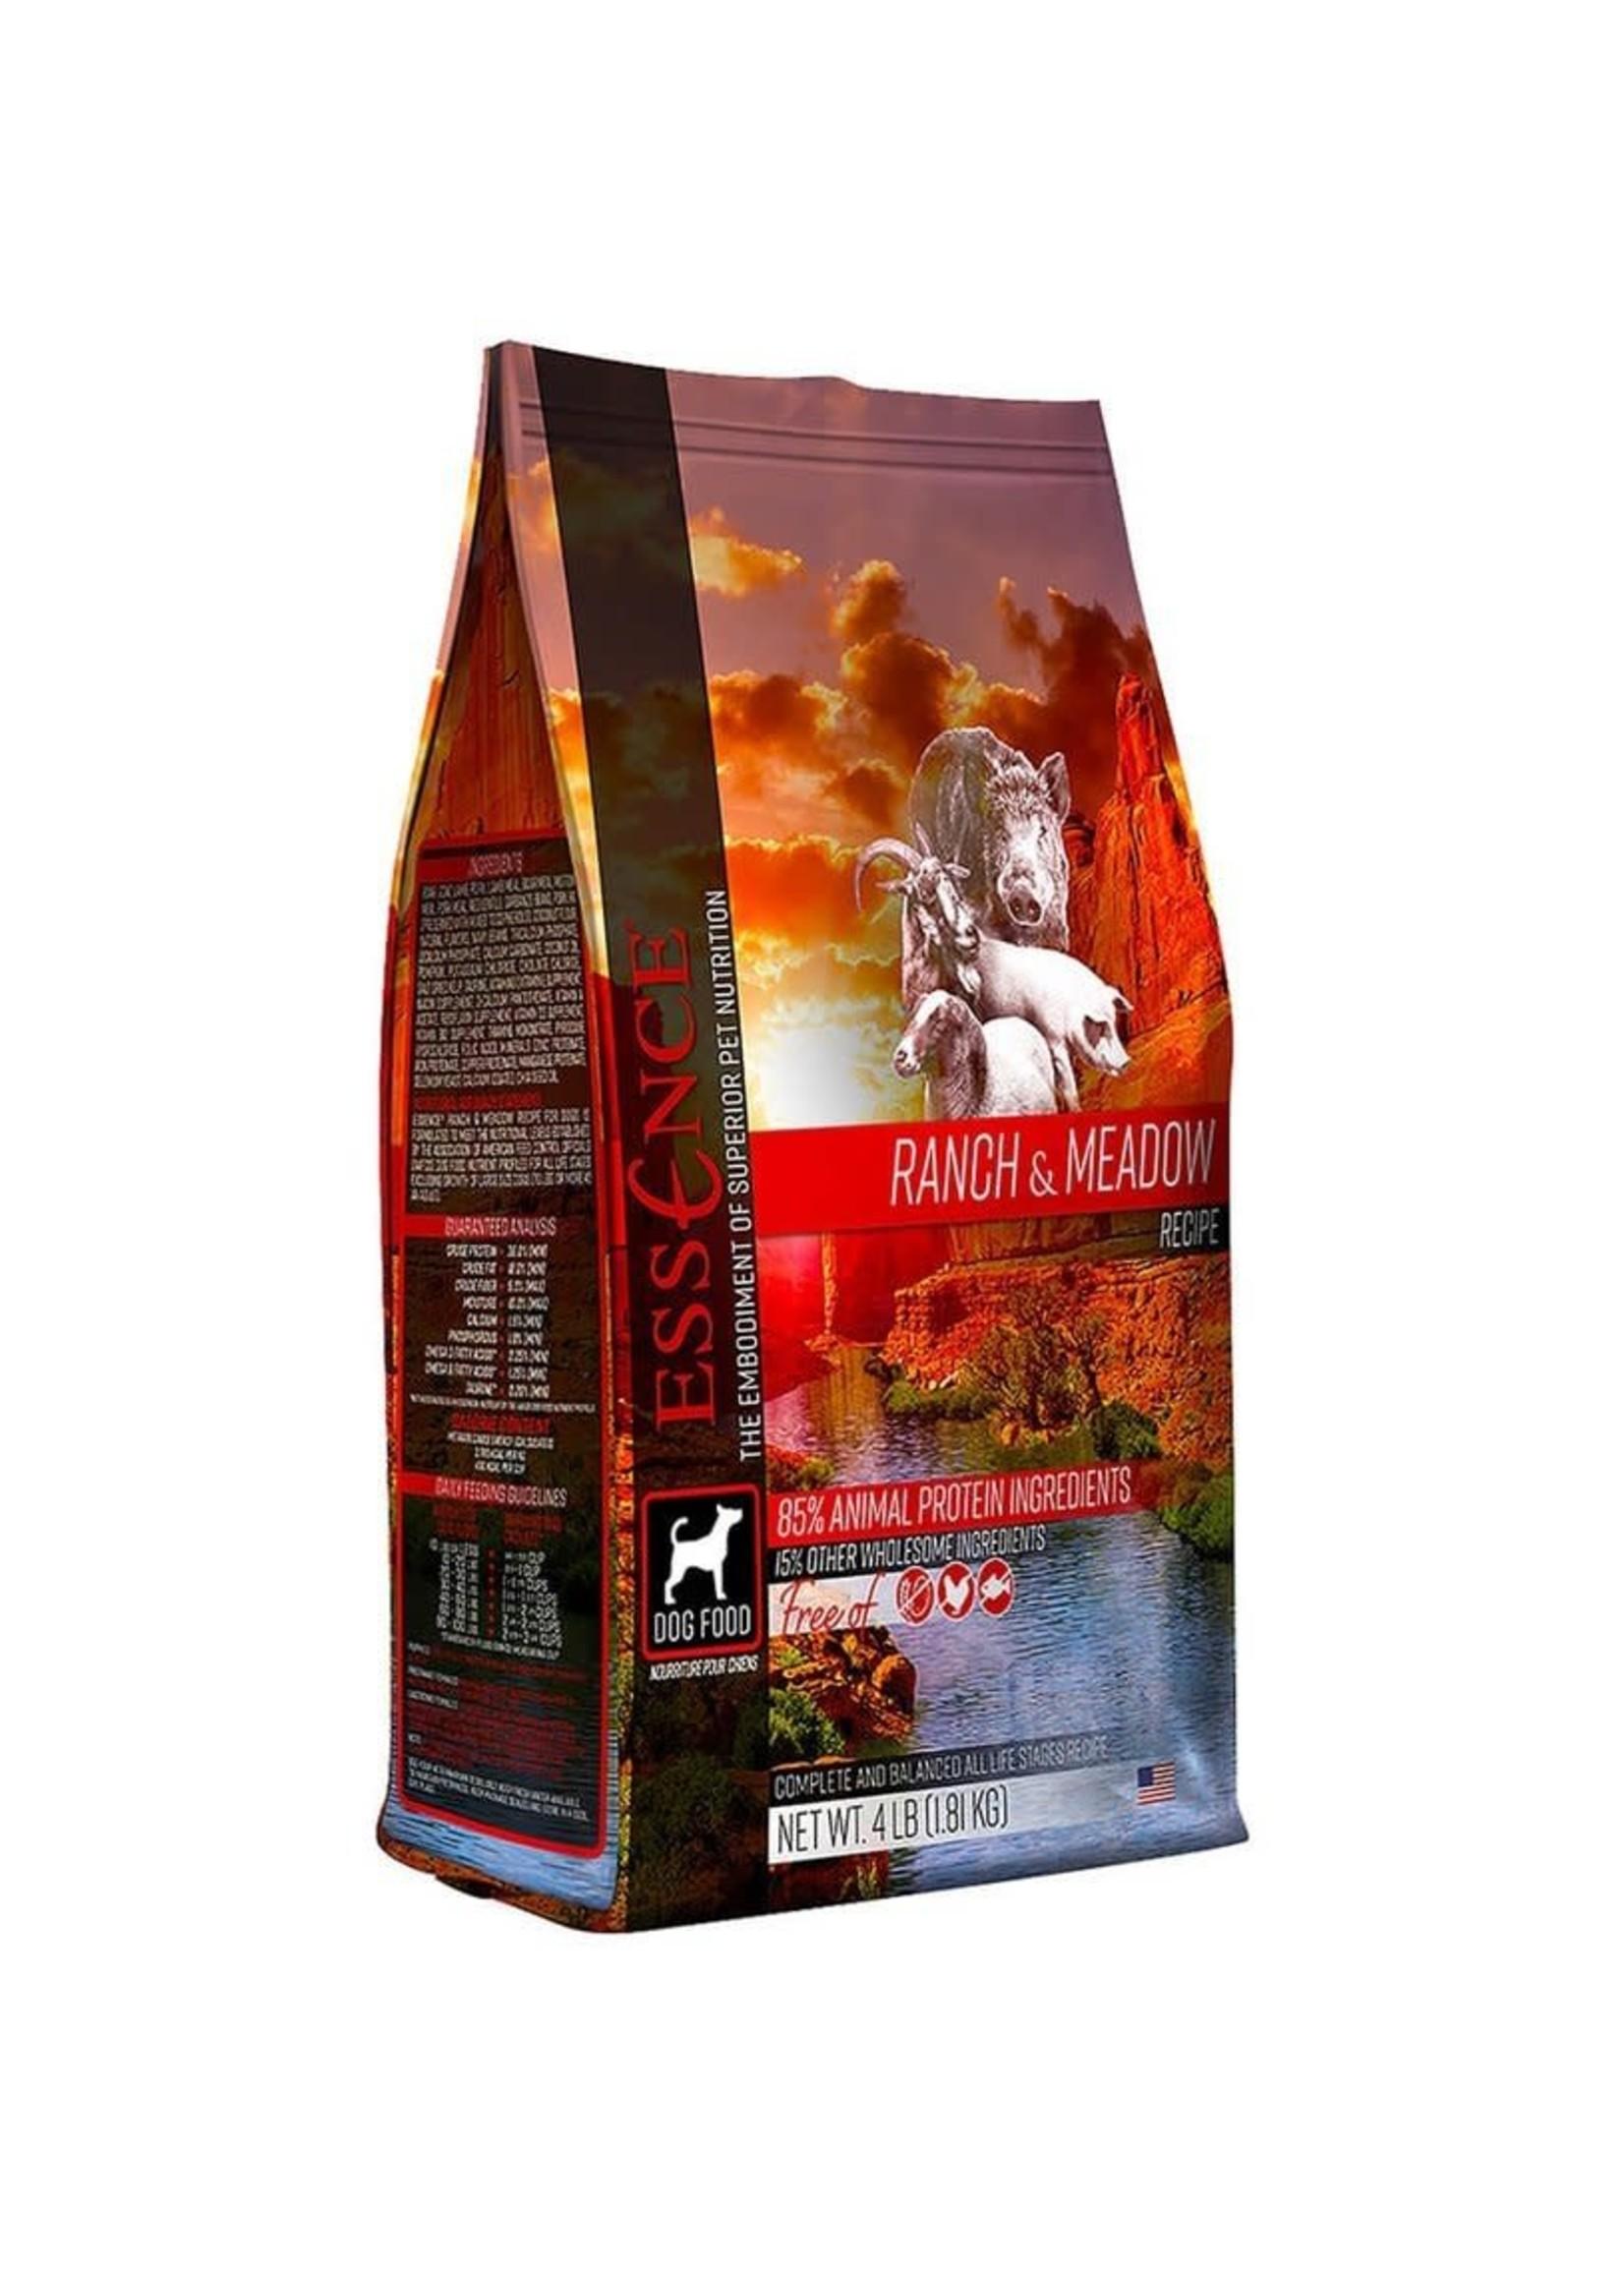 Essence Essence Ranch & Meadow Recipe Dry Dog Food 25lbs